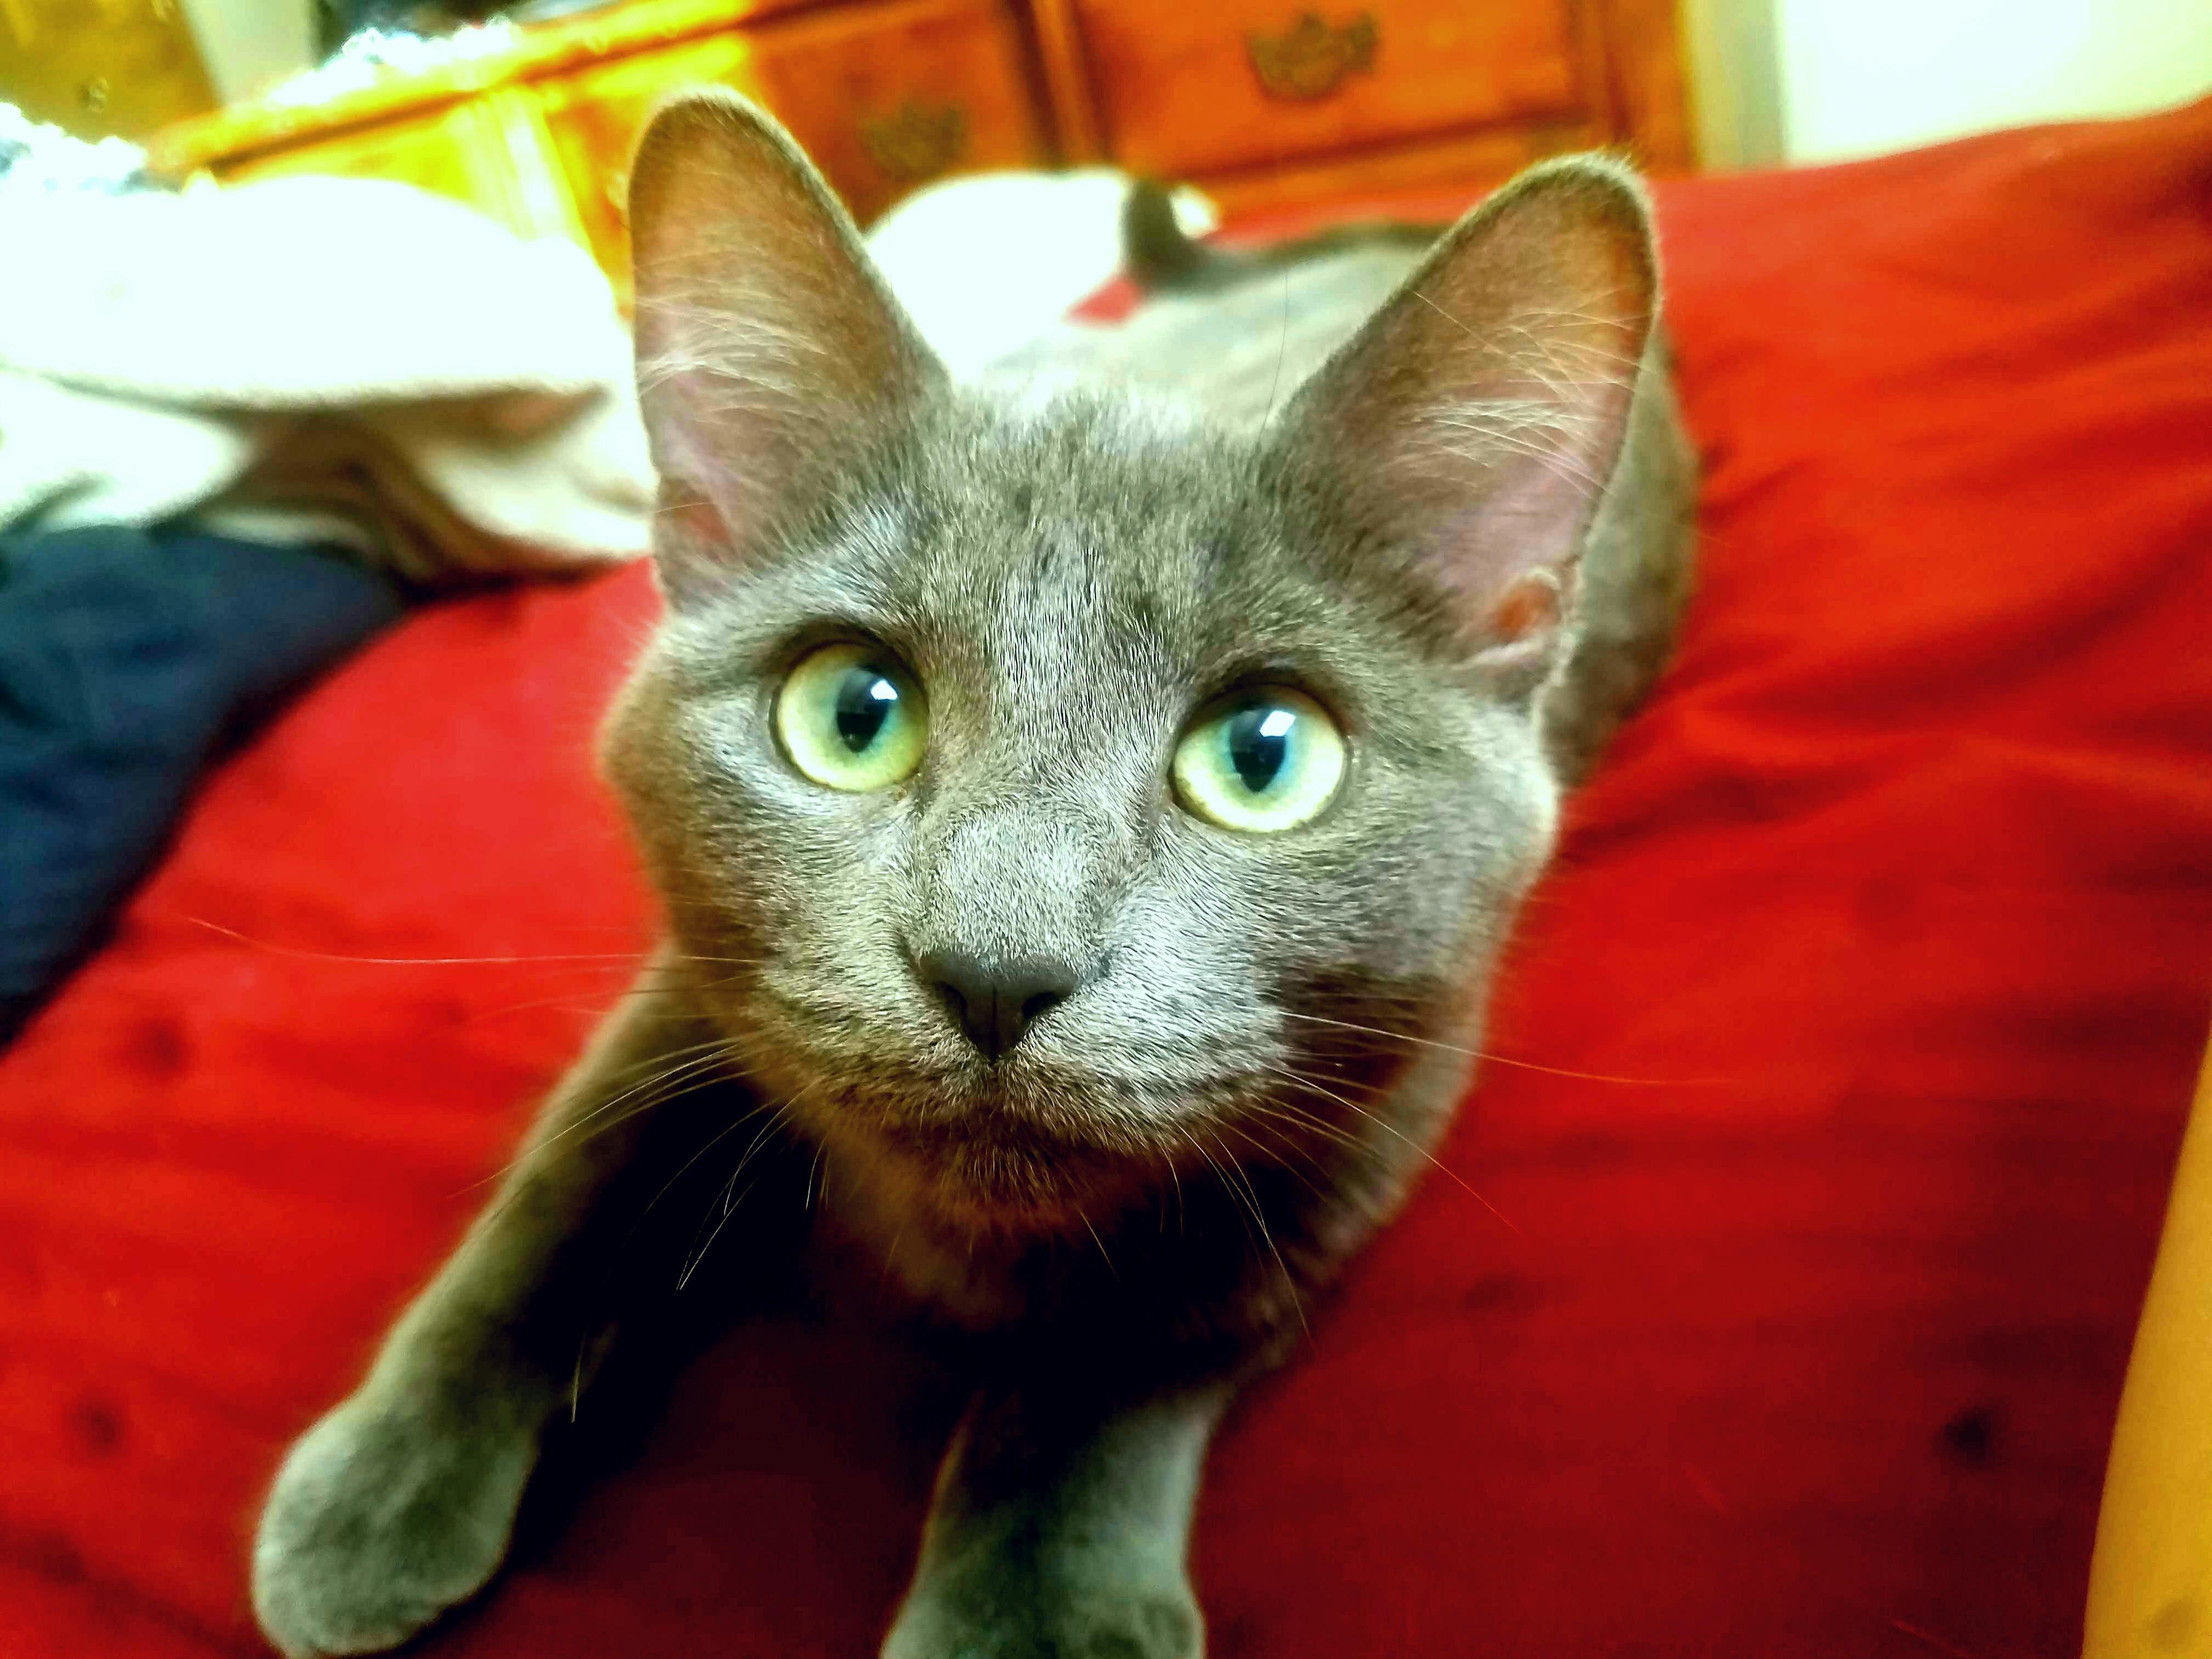 My kitten jynx